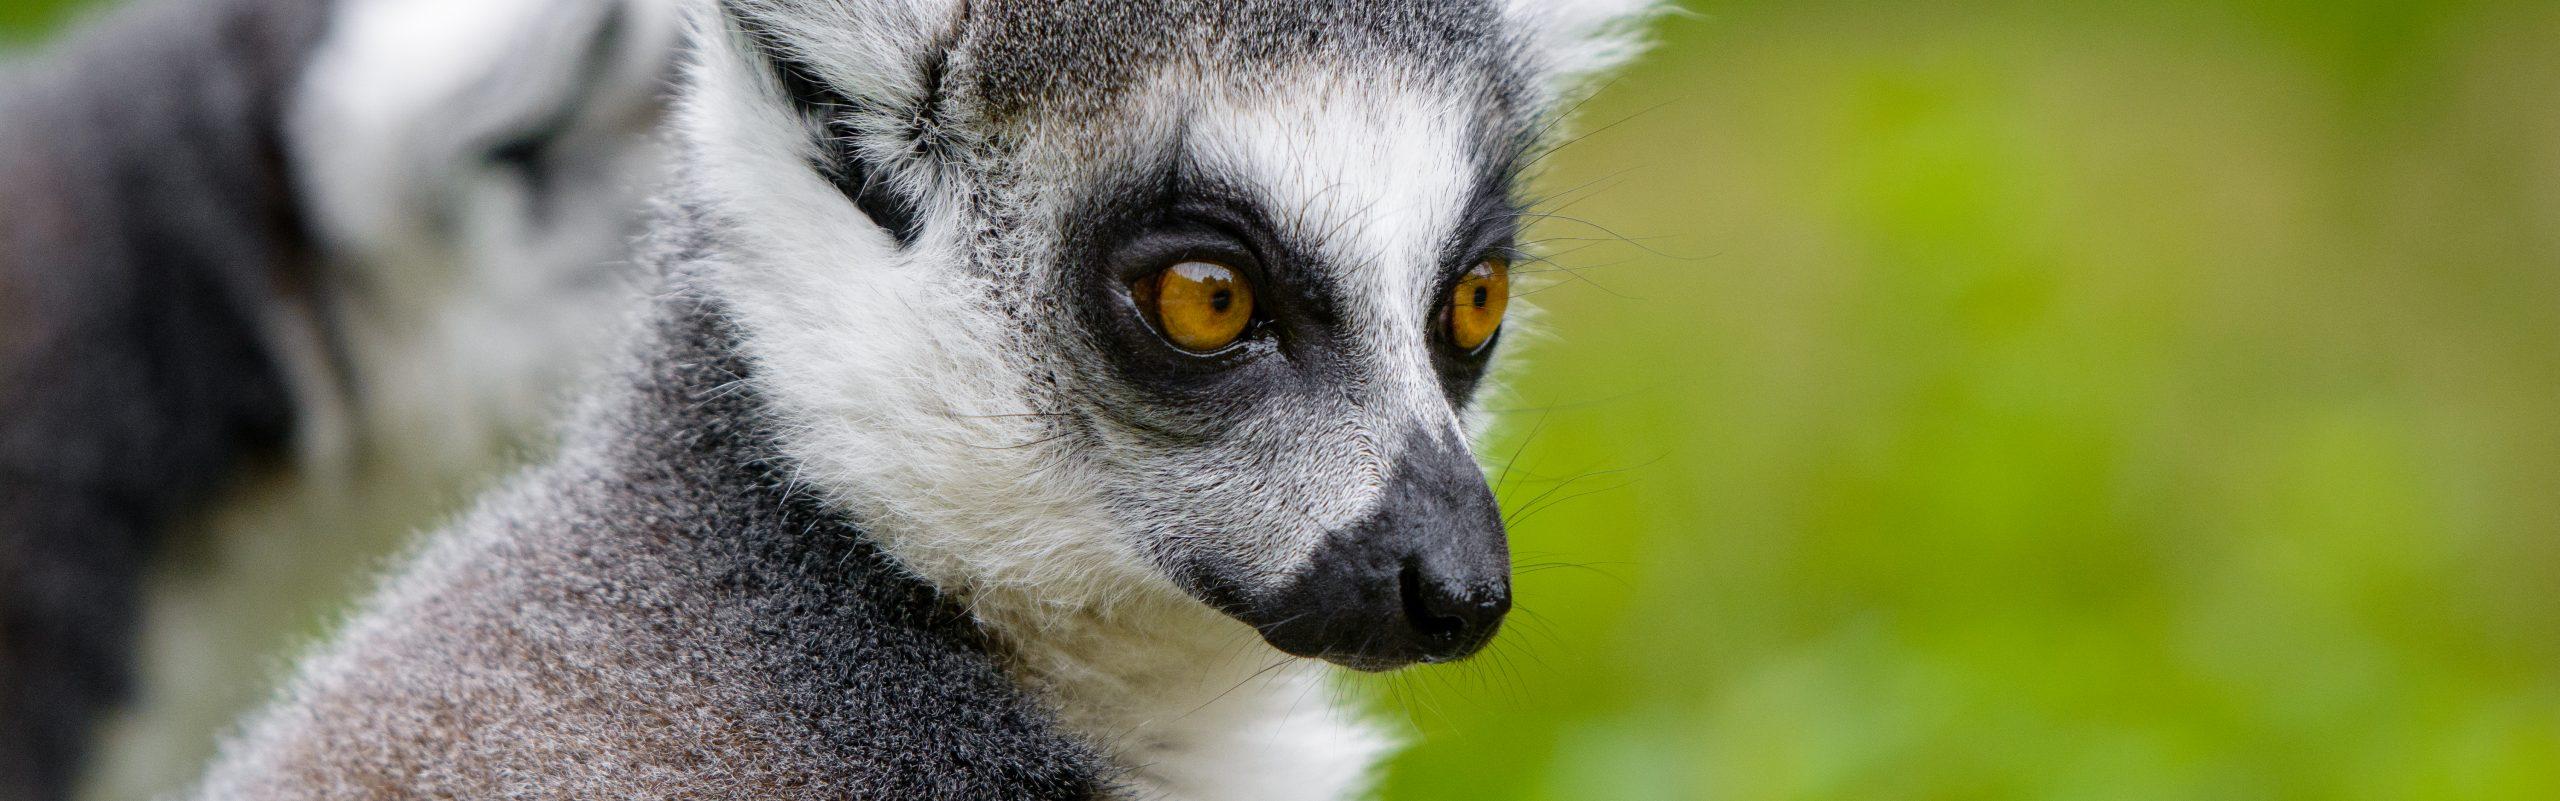 https://faunafocus.com/home/november-2018-ring-tailed-lemur/#jp-carousel-11952